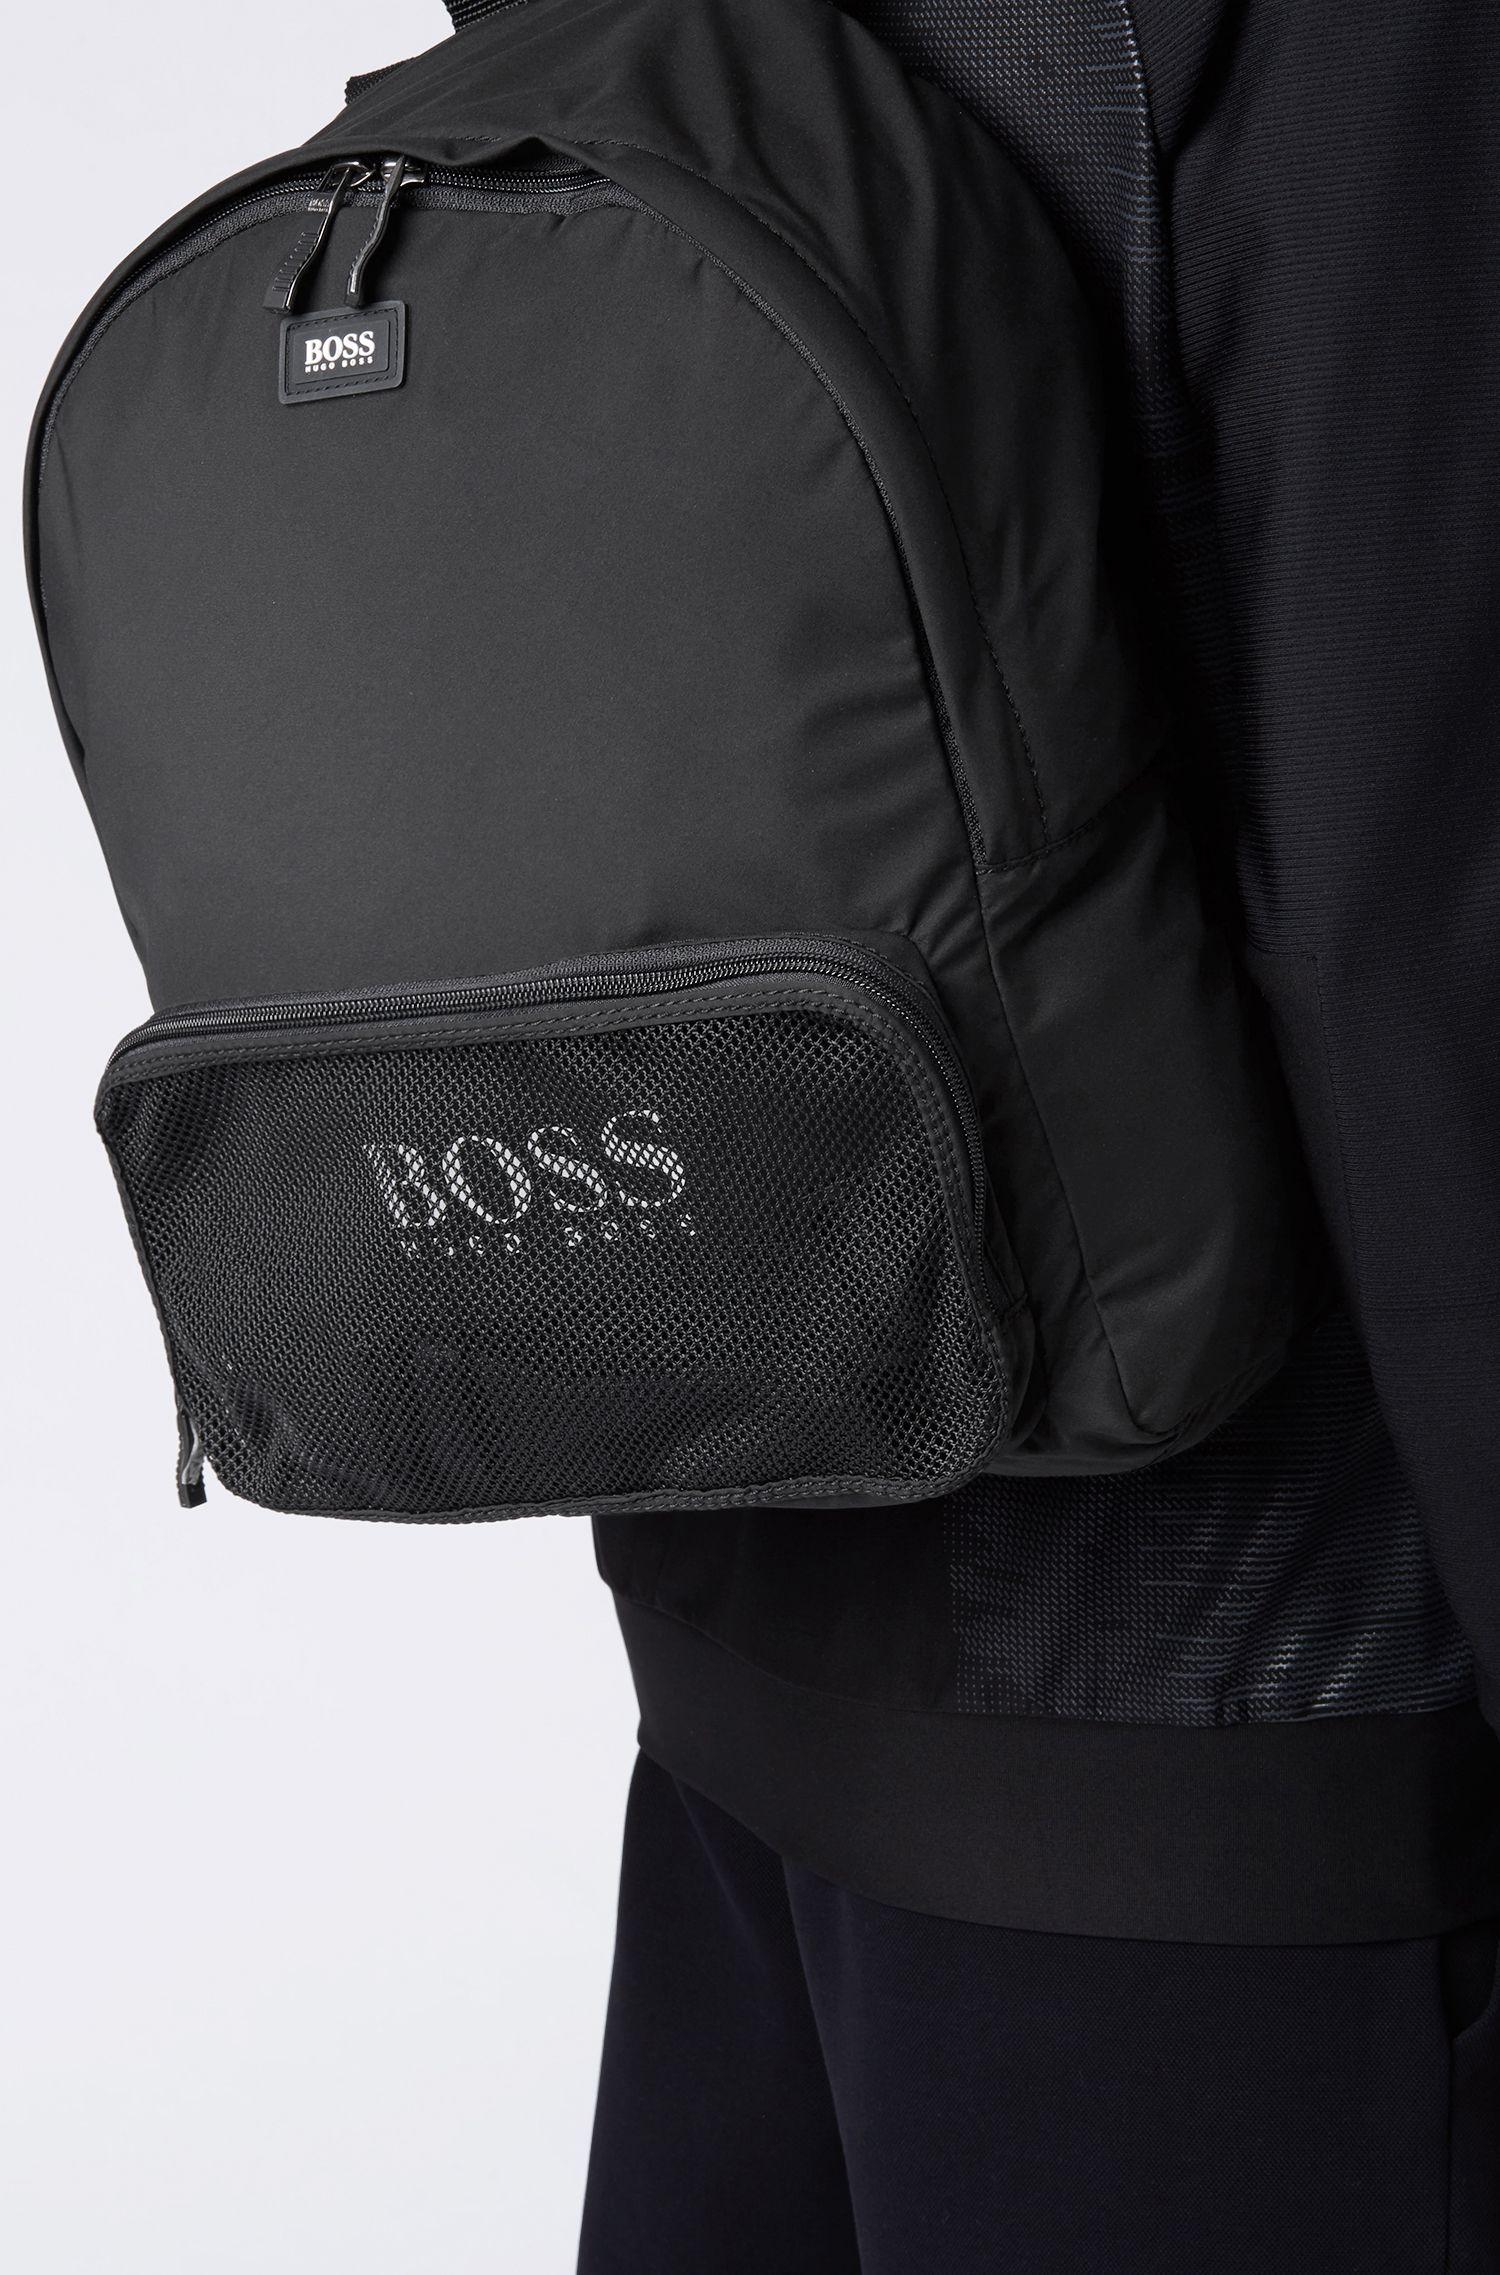 Wandelbarer Rucksack aus recyceltem Material-Mix mit Logo-Print, Schwarz